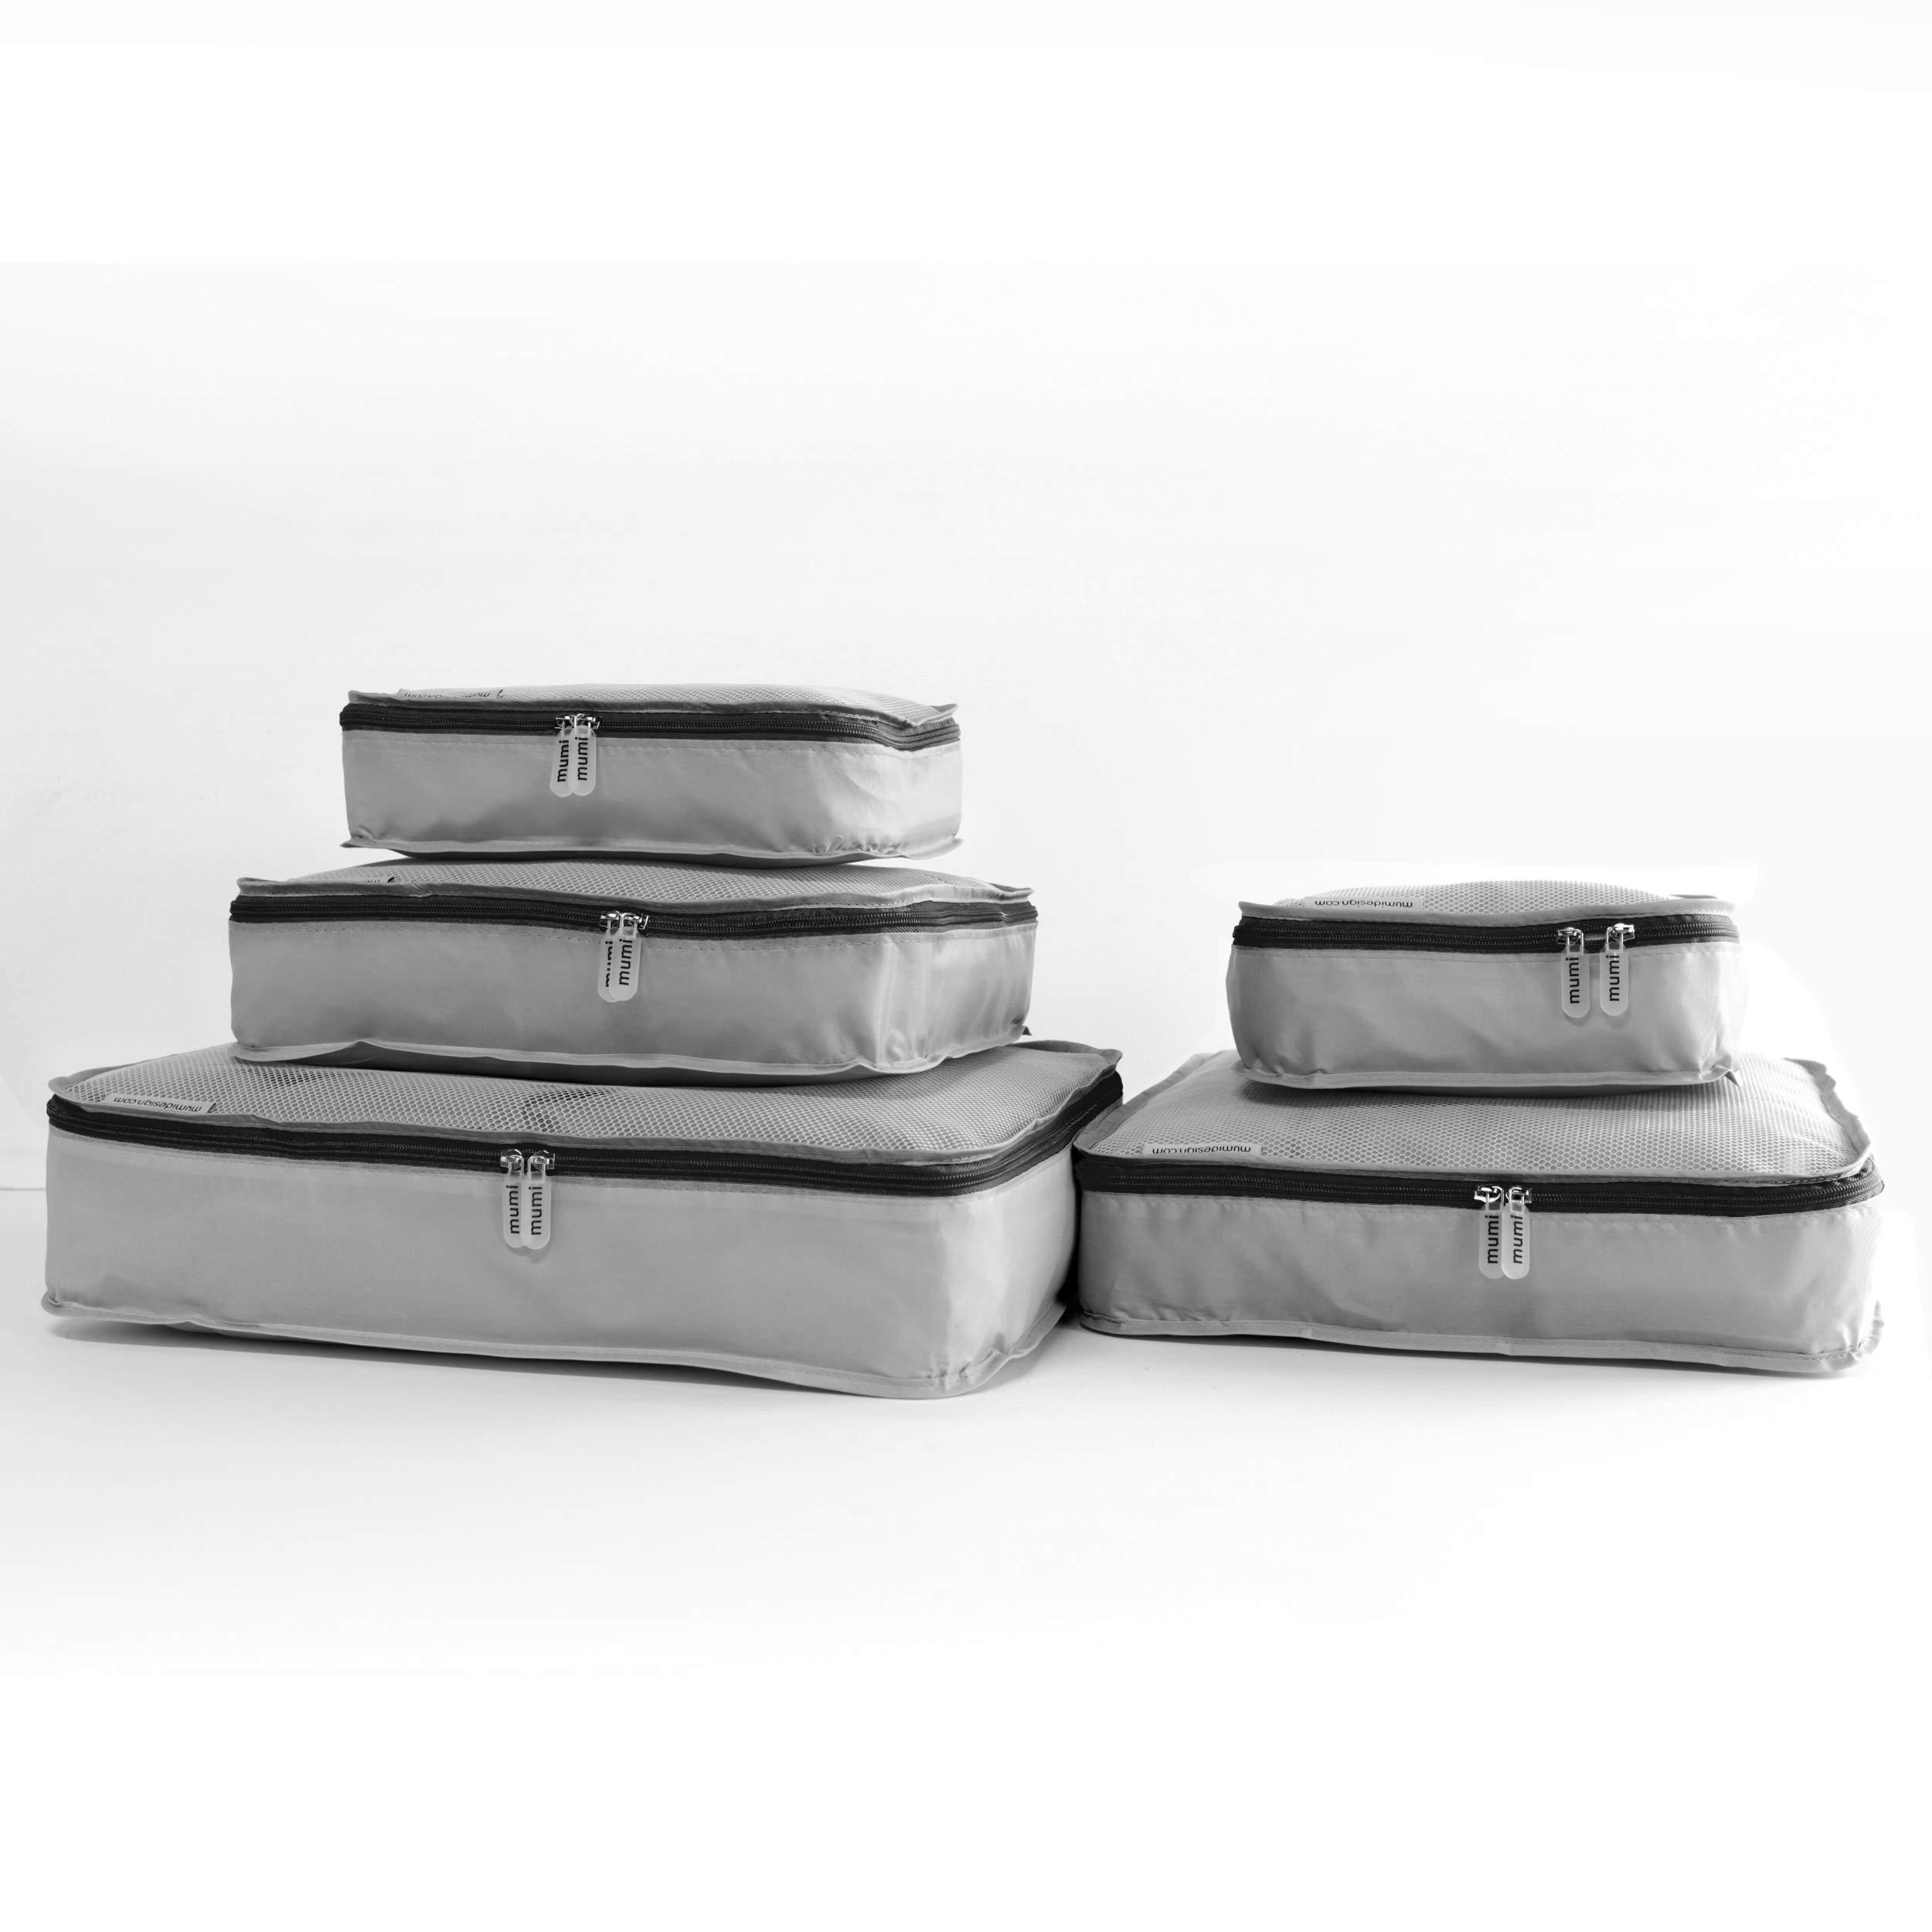 mumi Packing Cubes 5 Set Luggage Organizer Travel Cubes - Black by MUMI